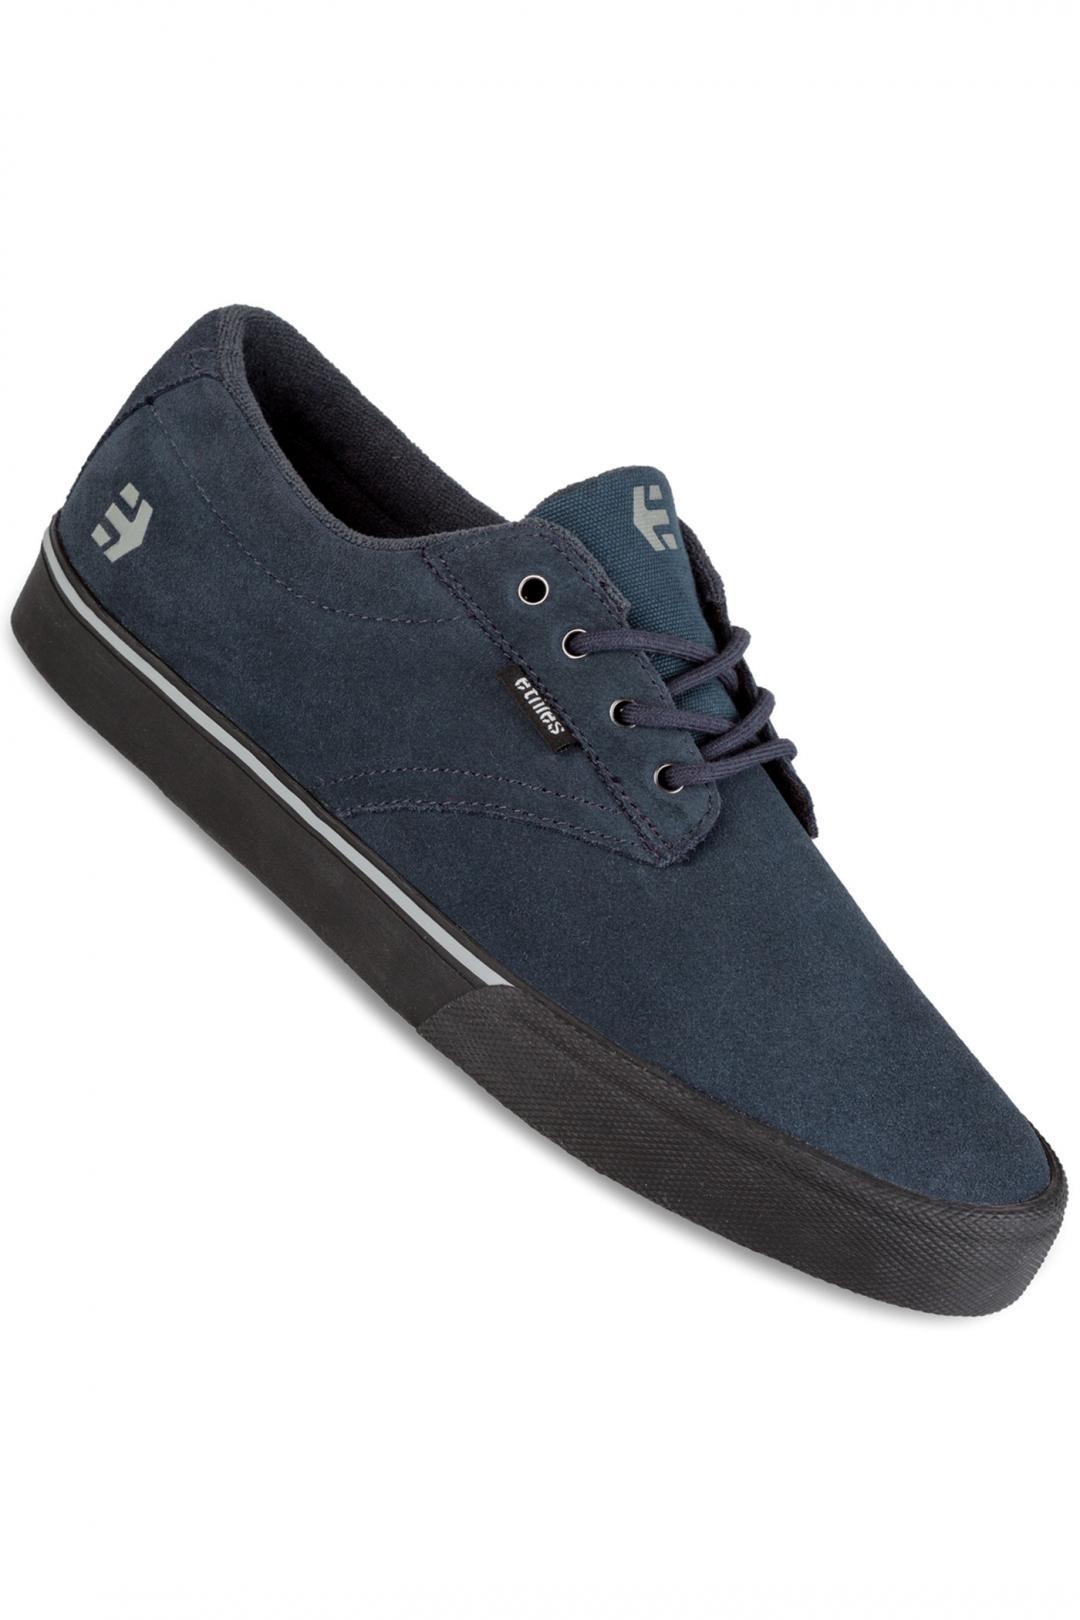 Uomo Etnies Jameson Vulc dark grey black | Sneakers low top